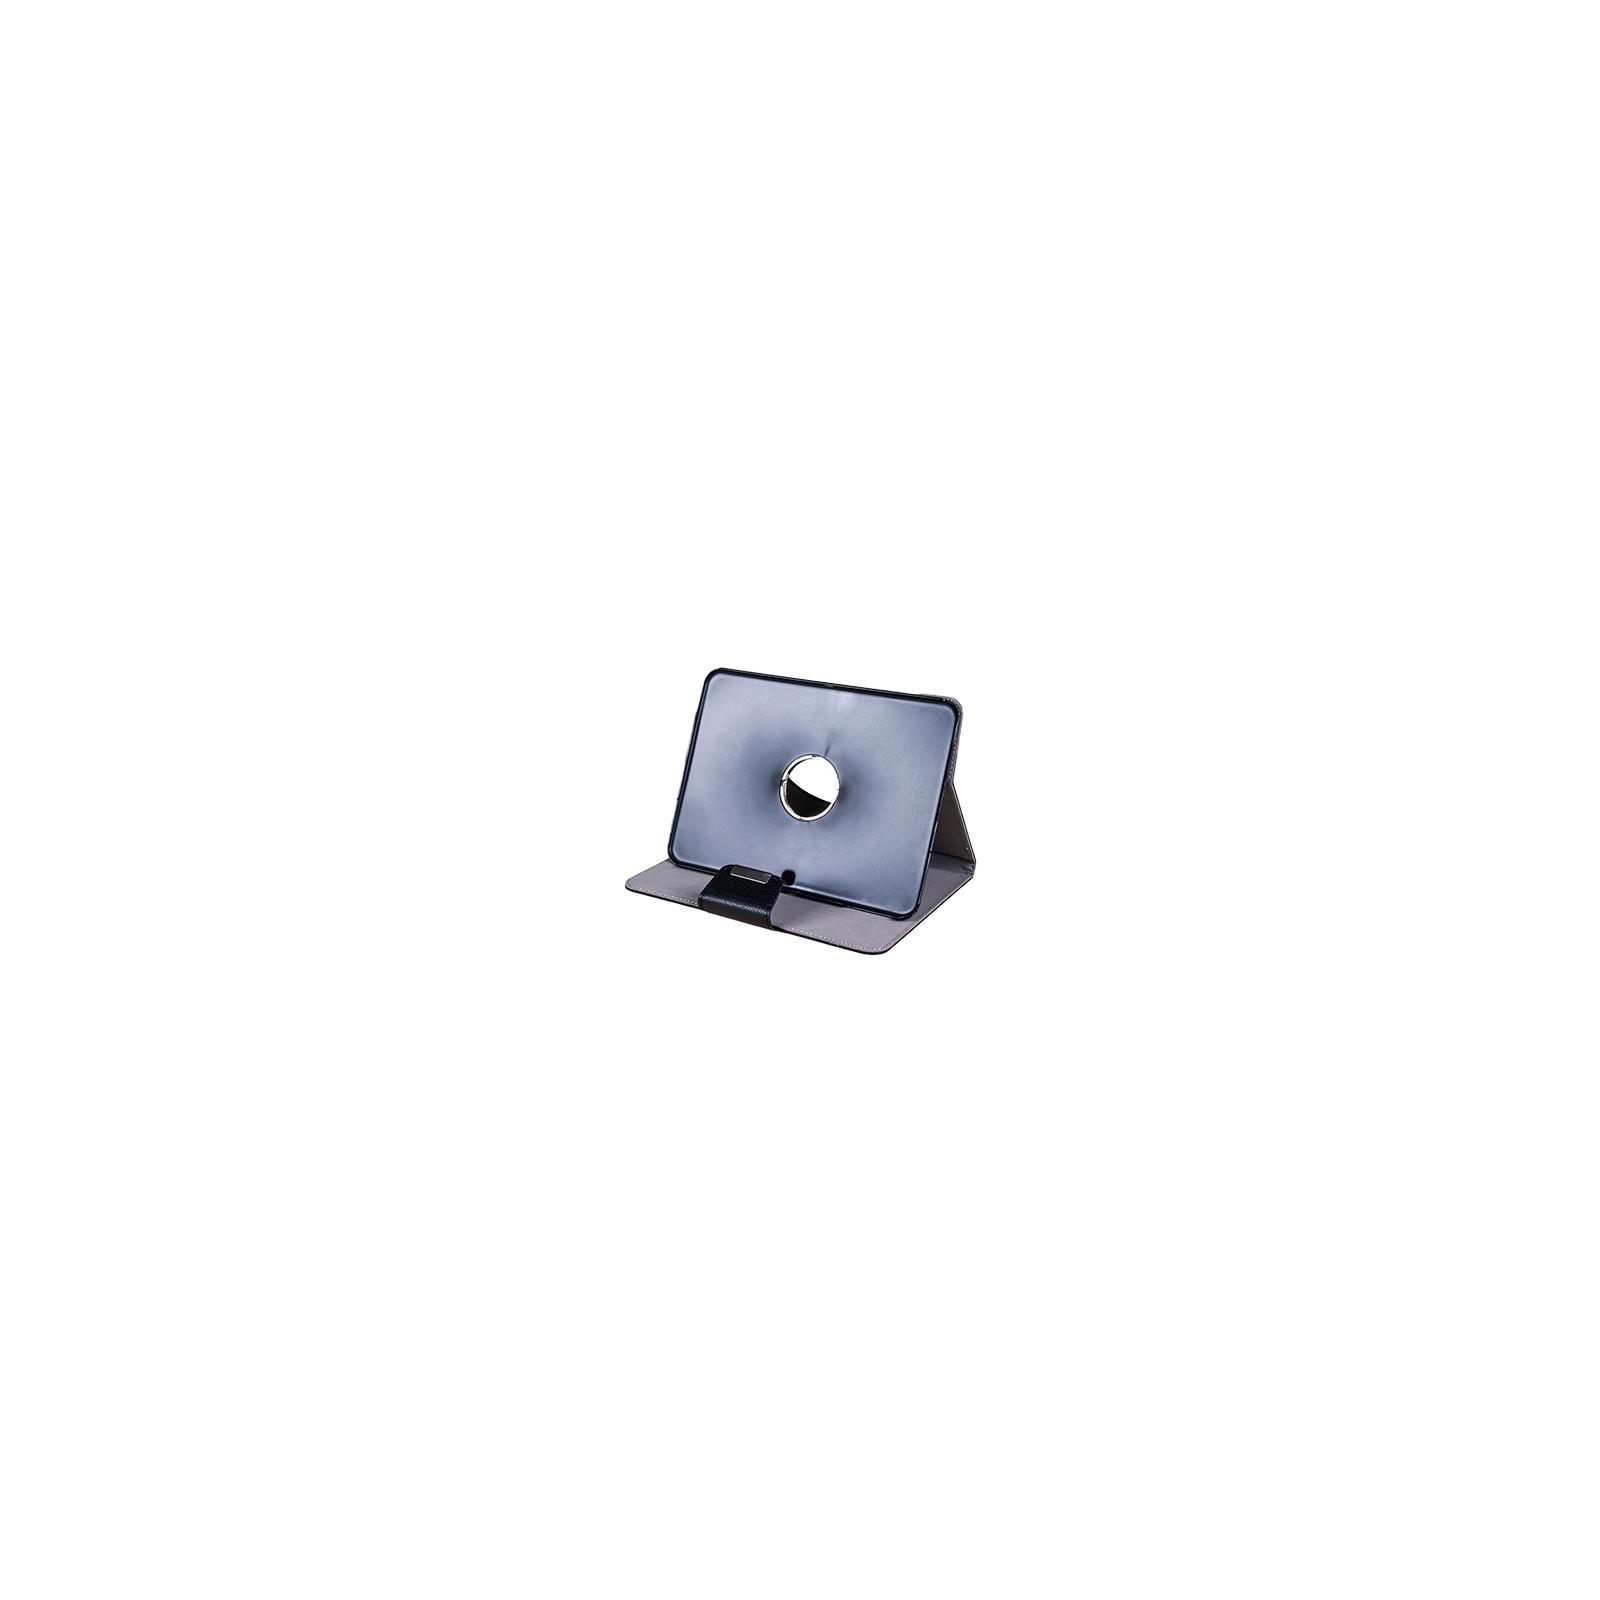 Чехол для планшета Drobak 10.1 Galaxy Tab3 (GT-P5210) Black (216033) изображение 2